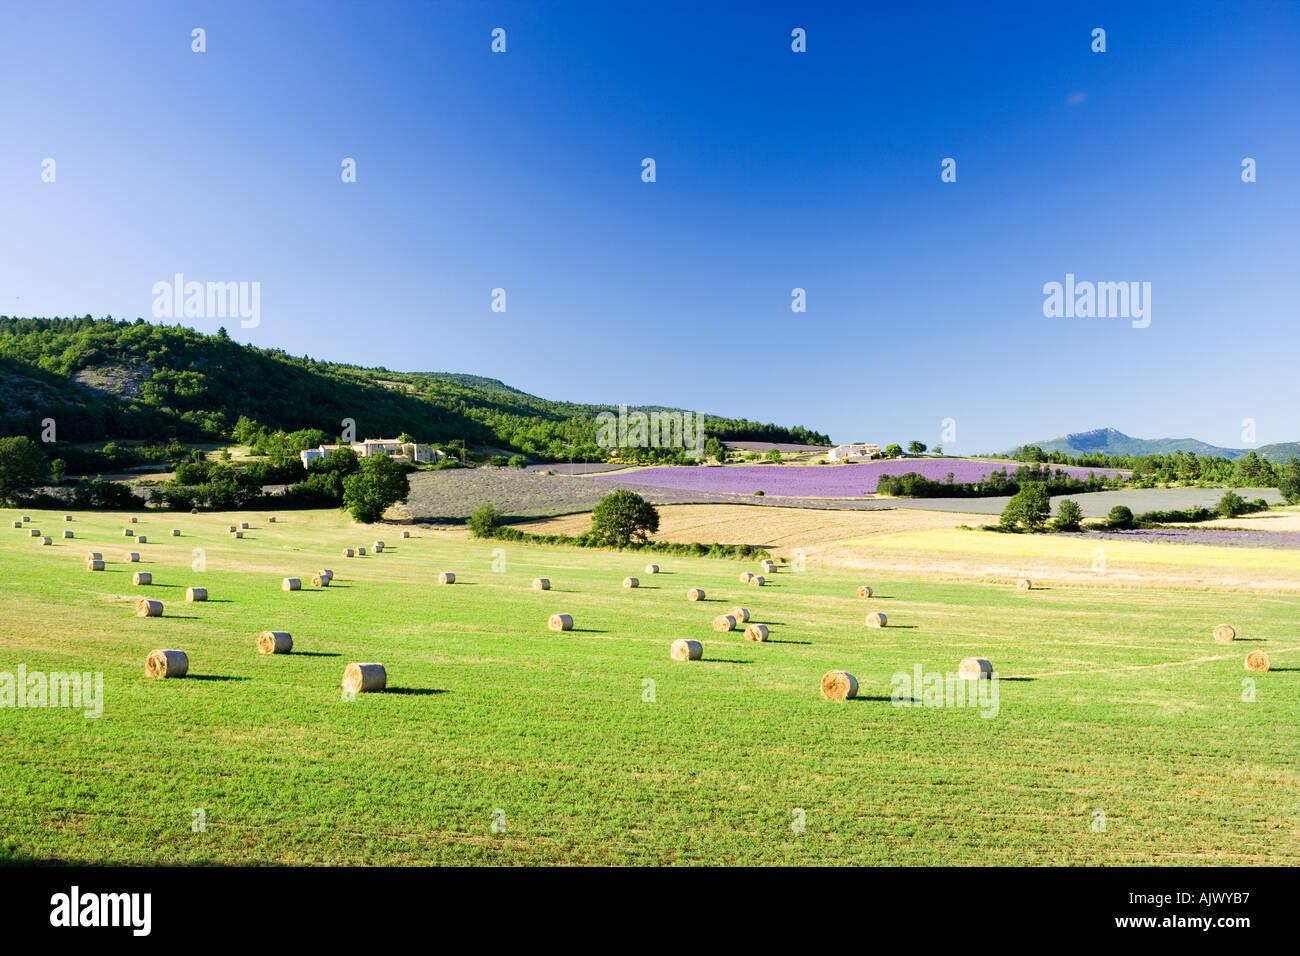 Frankreich Provence Vaucluse Region ländliche Szene mit Lavendel-Felder Stockbild